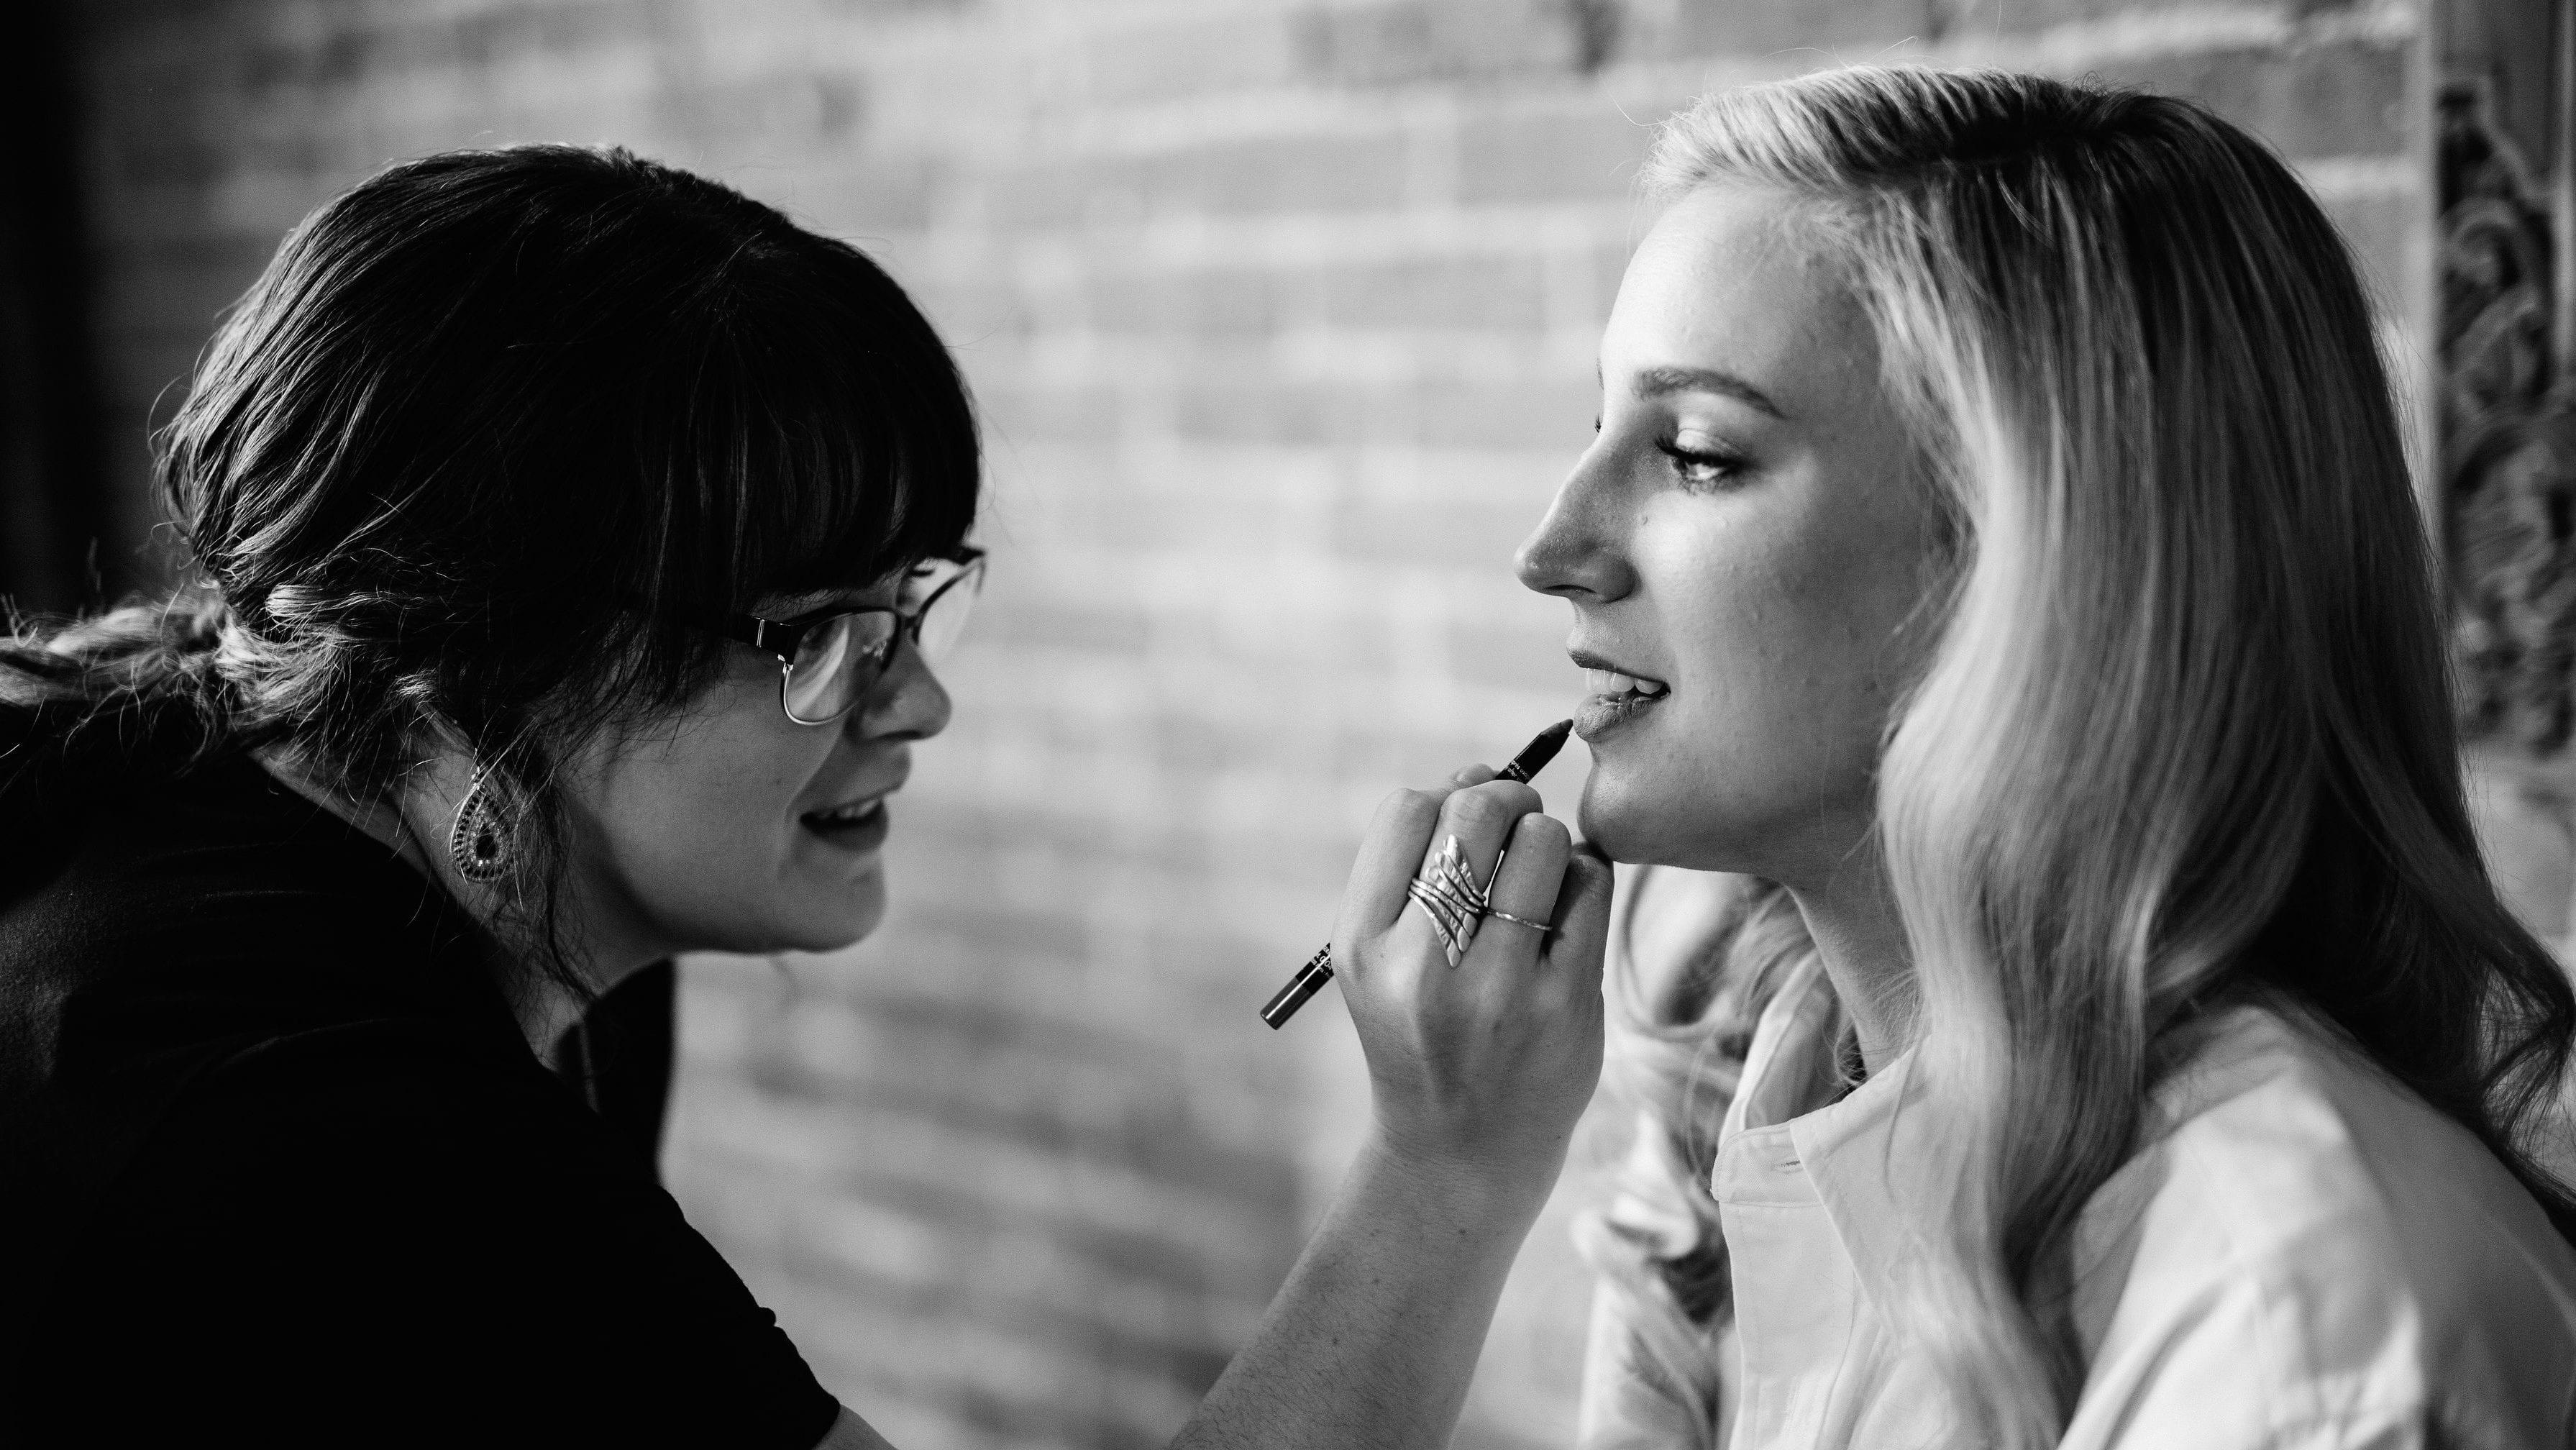 Destination makeup artist Coeur d alene Idaho